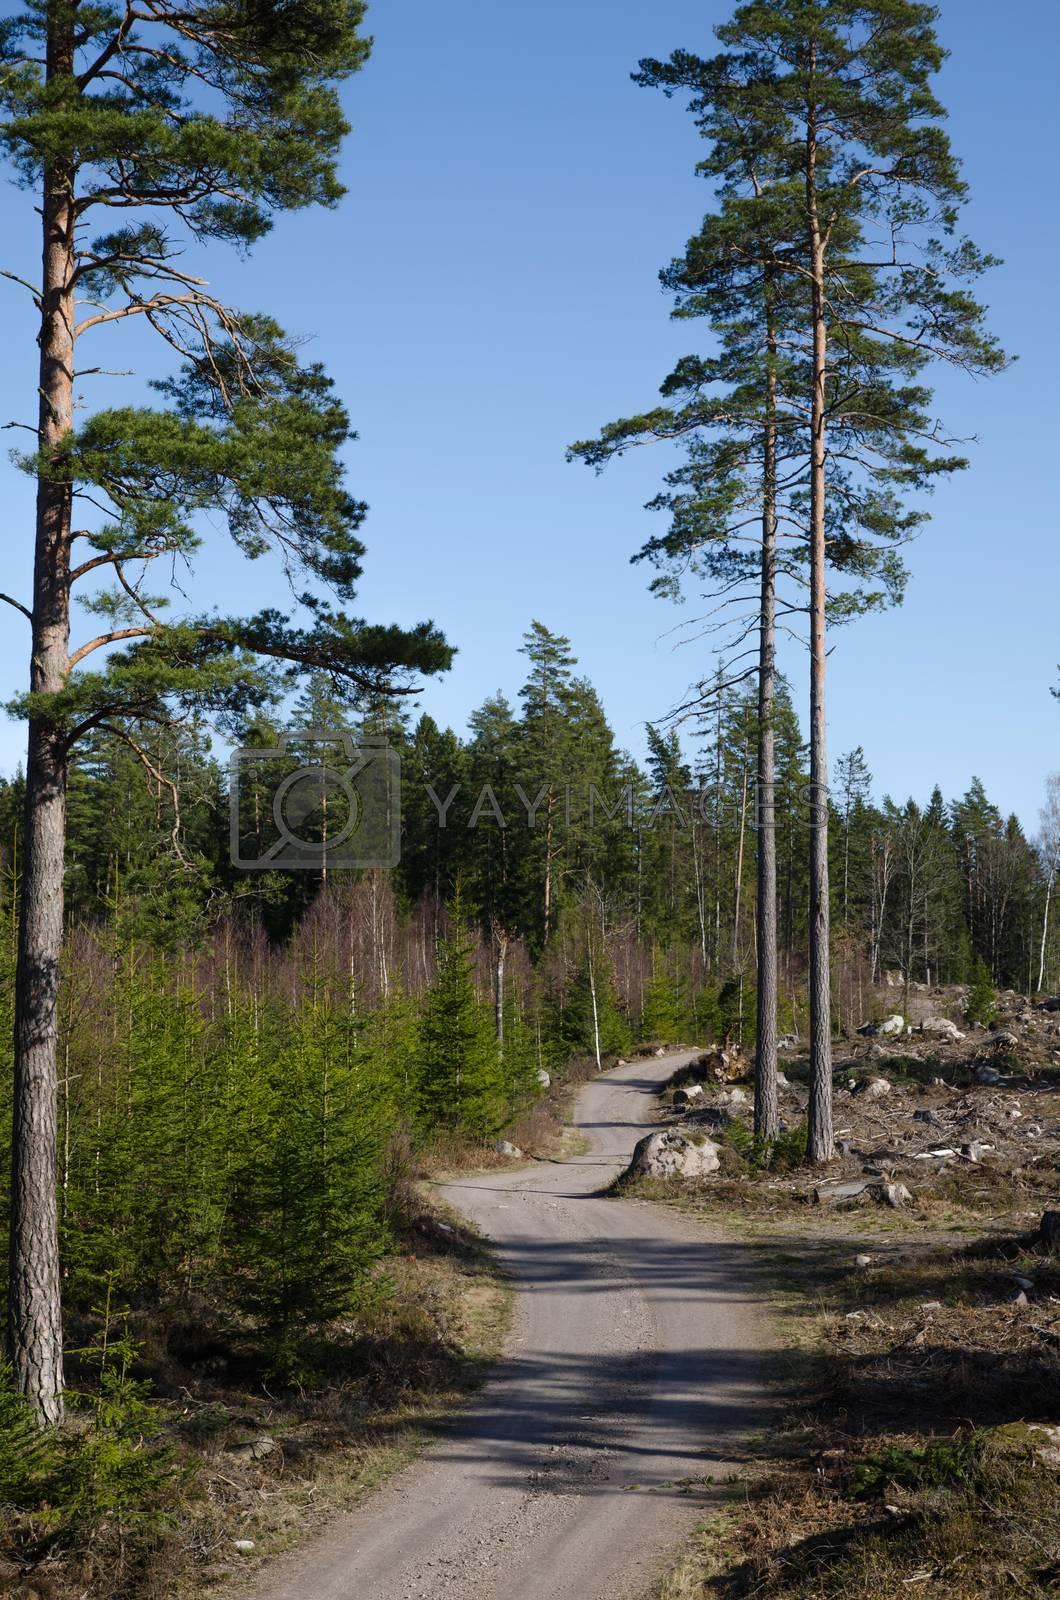 Royalty free image of Winding dirt road by olandsfokus